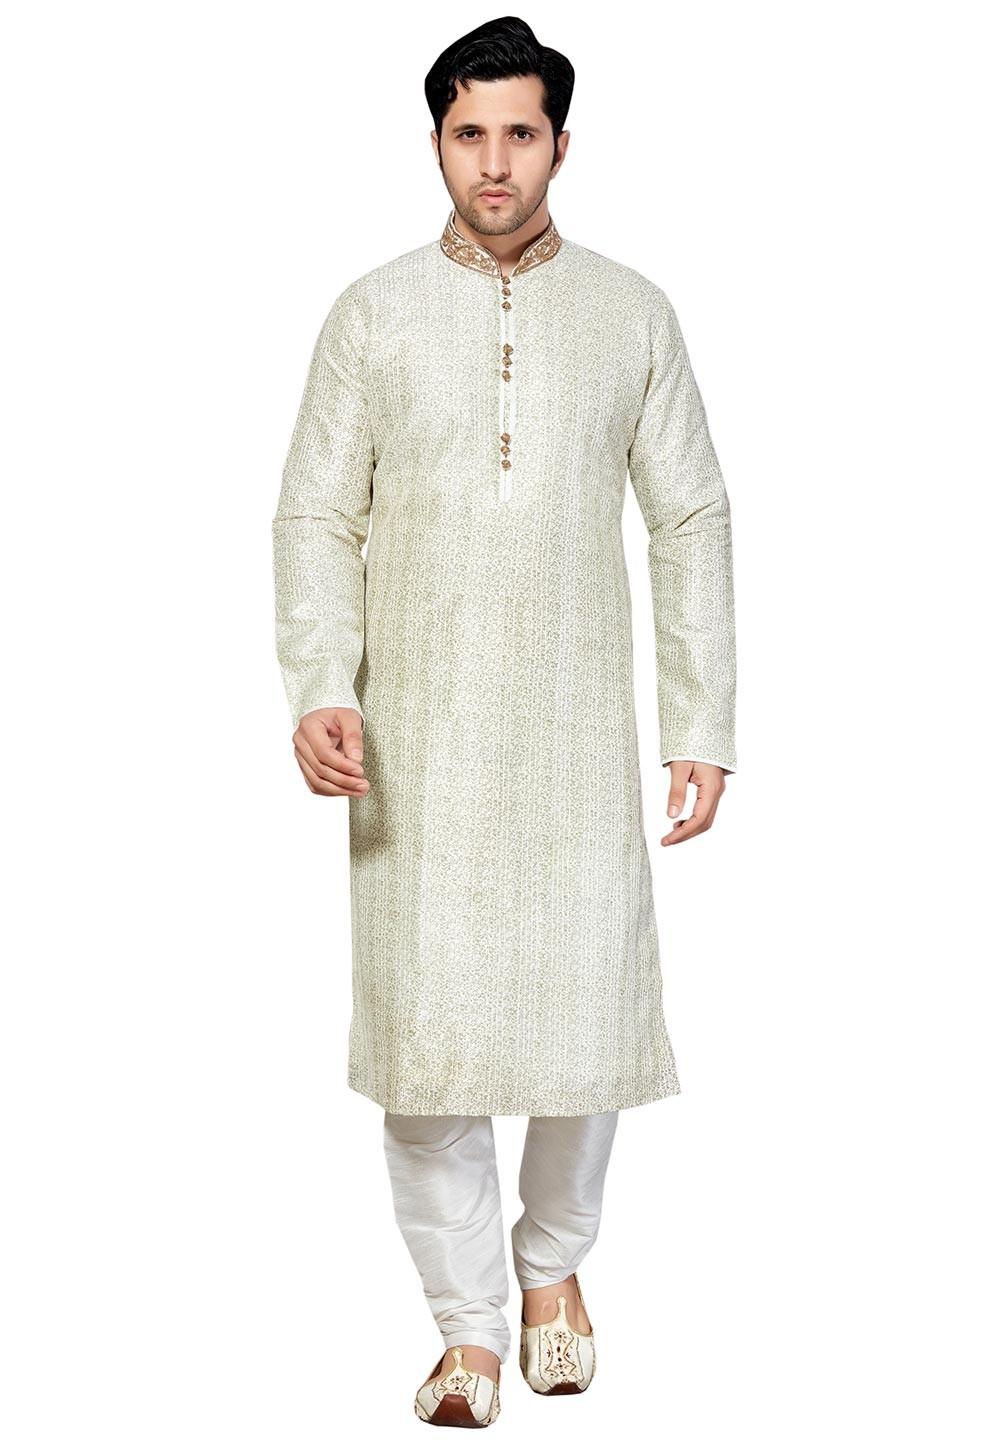 Exquisite Off White Color Dupion Silk Kurta Pajama With Thread Work.